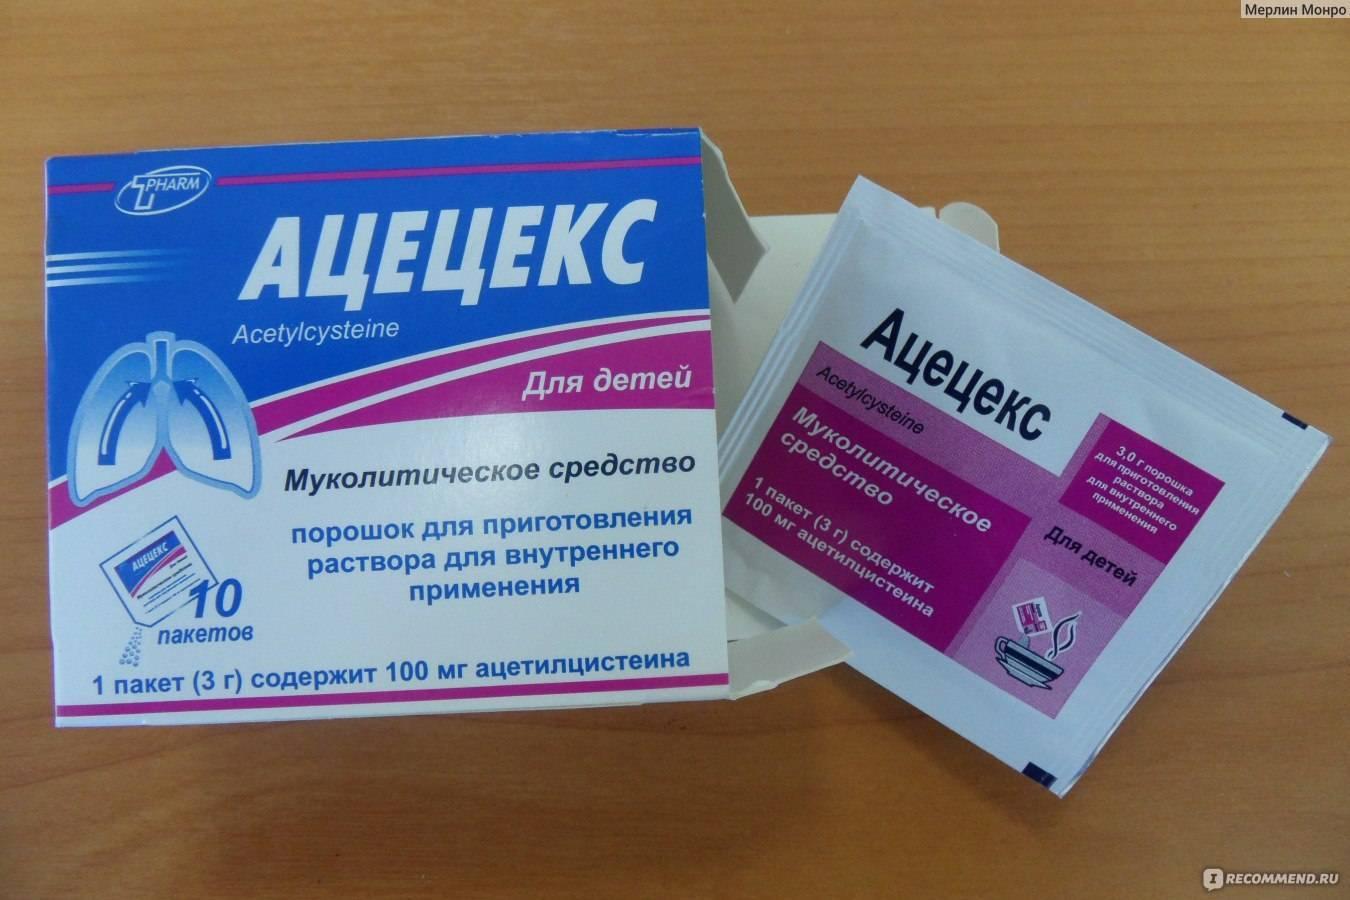 Ацц - инструкция по применению порошка, сиропа или шипучих таблеток